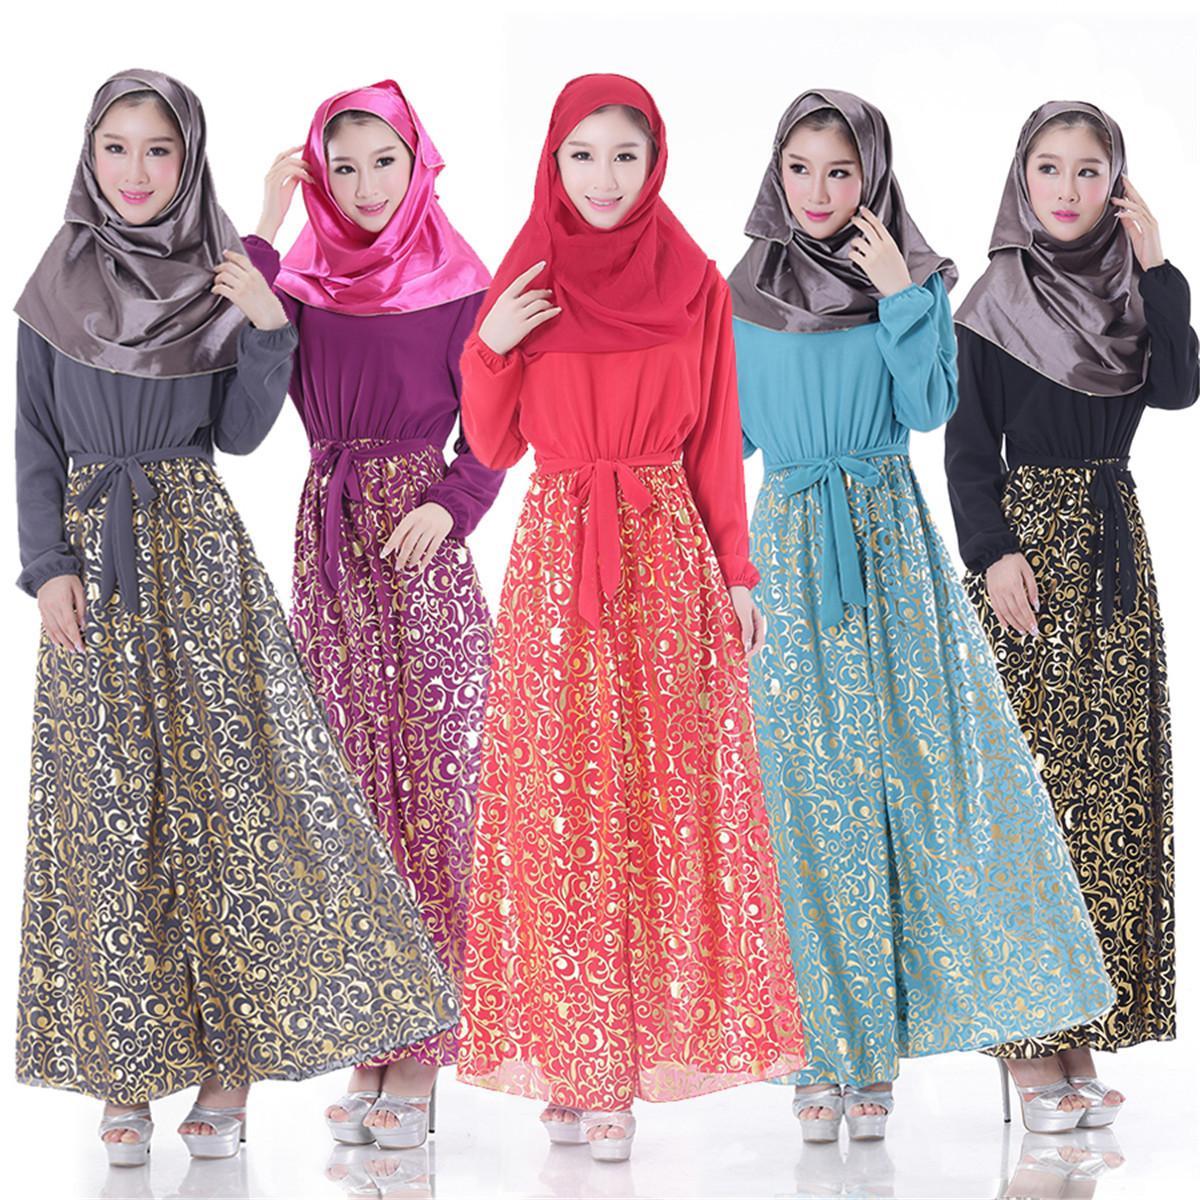 Ihram Kids For Sale Dubai: 2019 Muslim Arab Robes Robes Muslim Women Chiffon Long